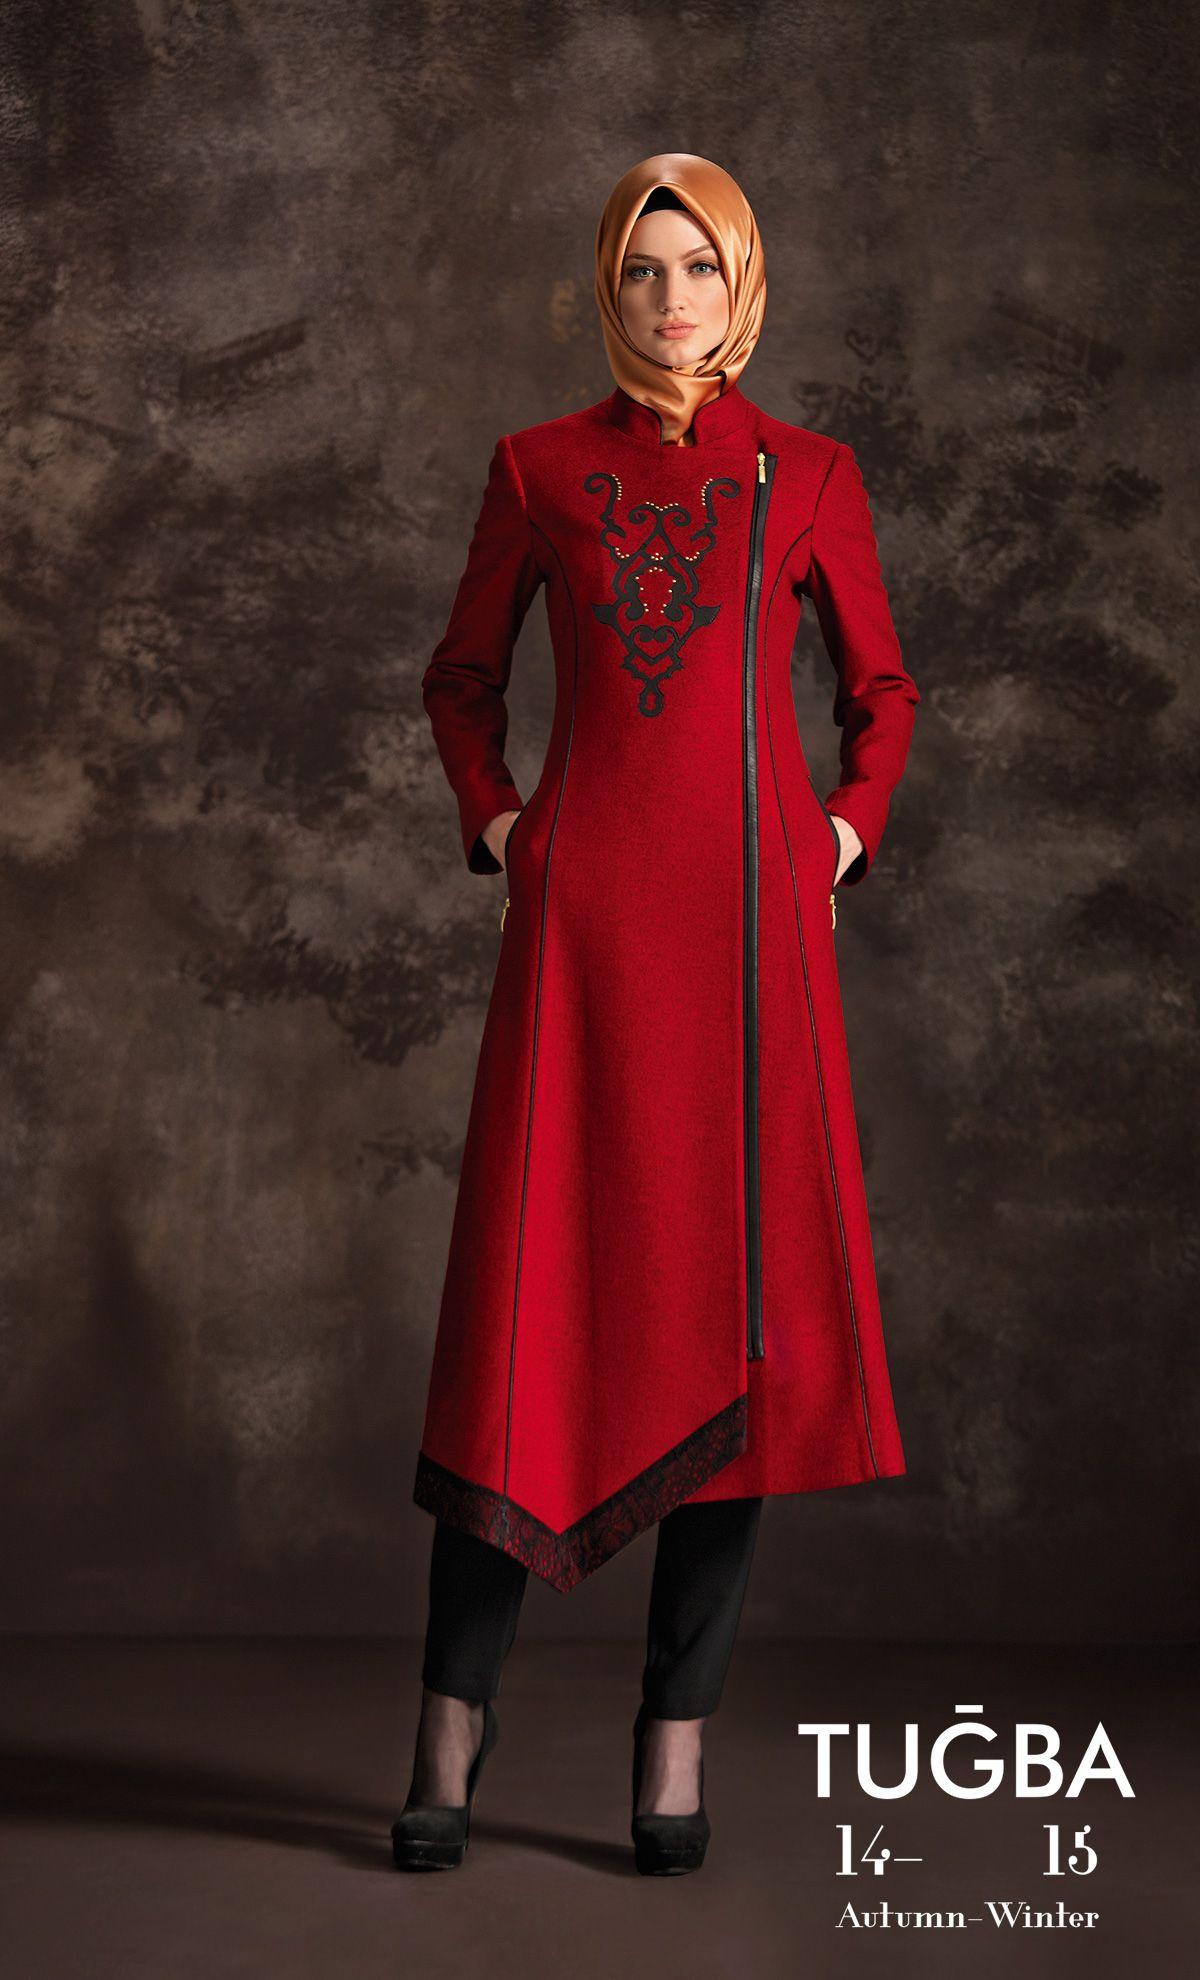 Tugba Http Www Tugbaonline Com Urun Izle Aspx Md 2553 Model Pakaian Hijab Pakaian Wanita Model Pakaian